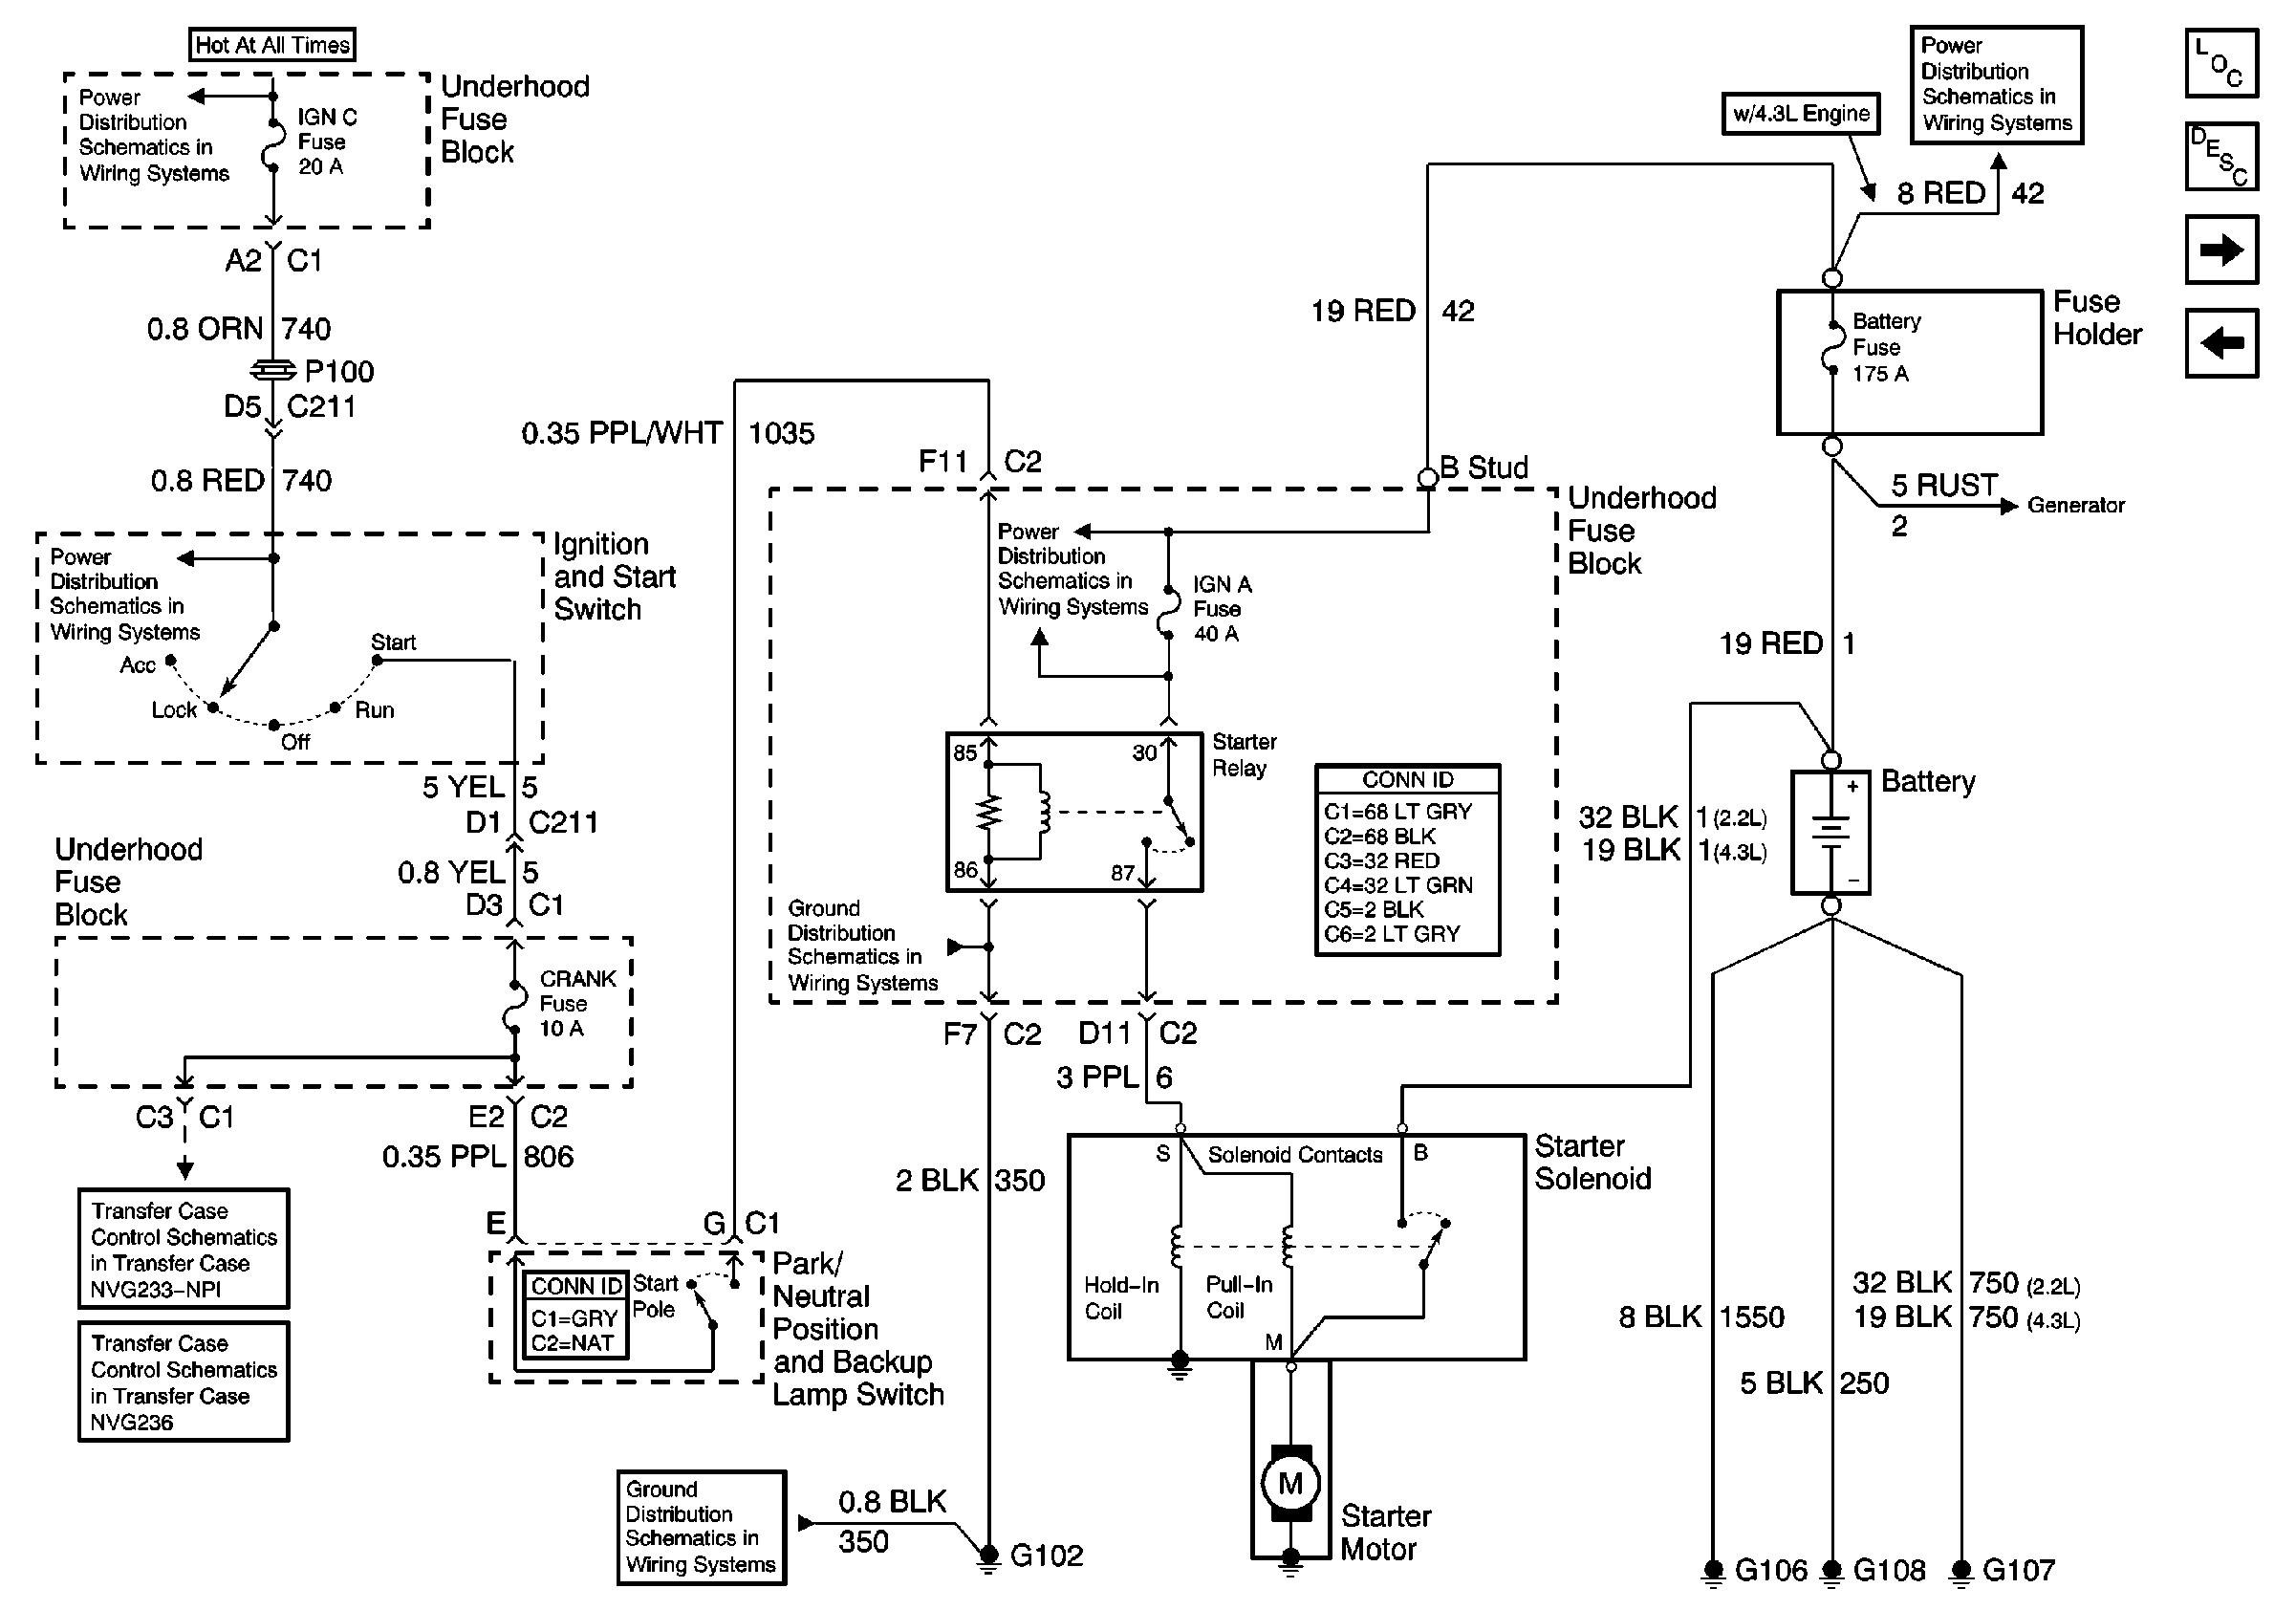 2003 Chevy Blazer Engine Diagram Need Wiring Diagran for Starter Circuit 2000 Chevy Blazer Throughout